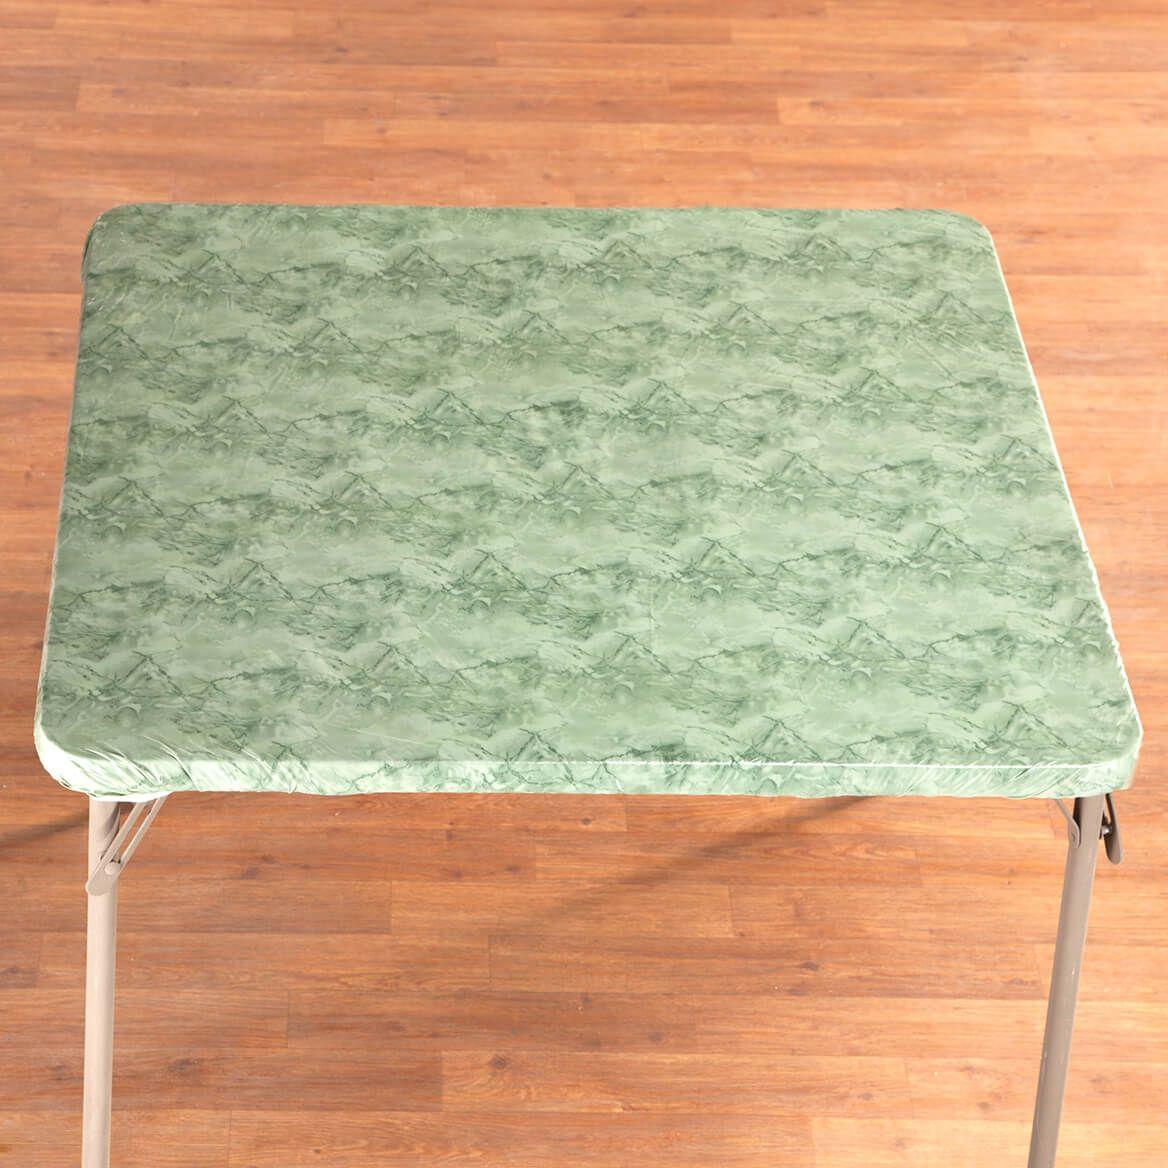 Marble Vinyl Elasticized Banquet Table Cover-356493